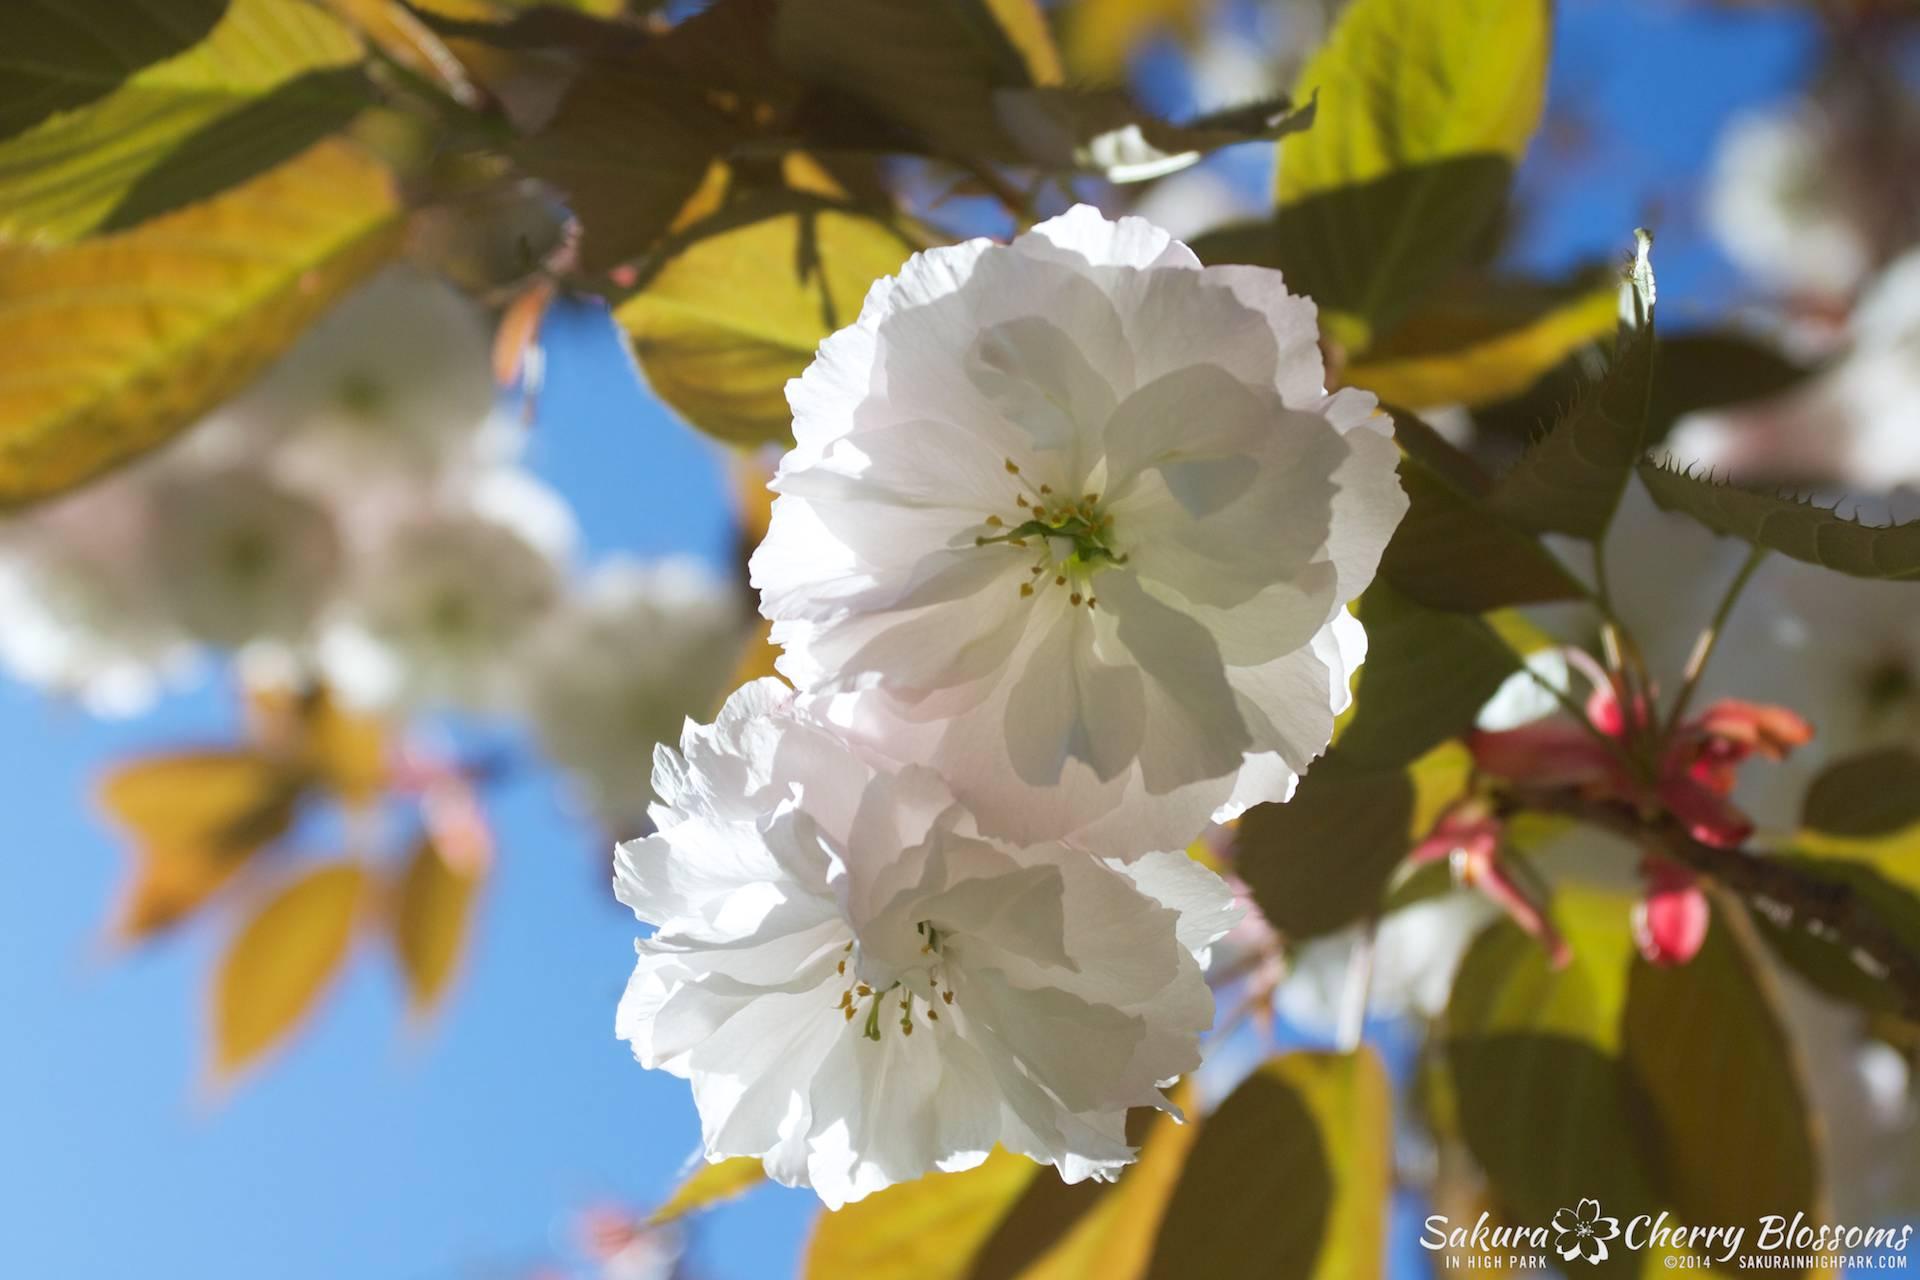 SakuraInHighPark-May2414-393.jpg